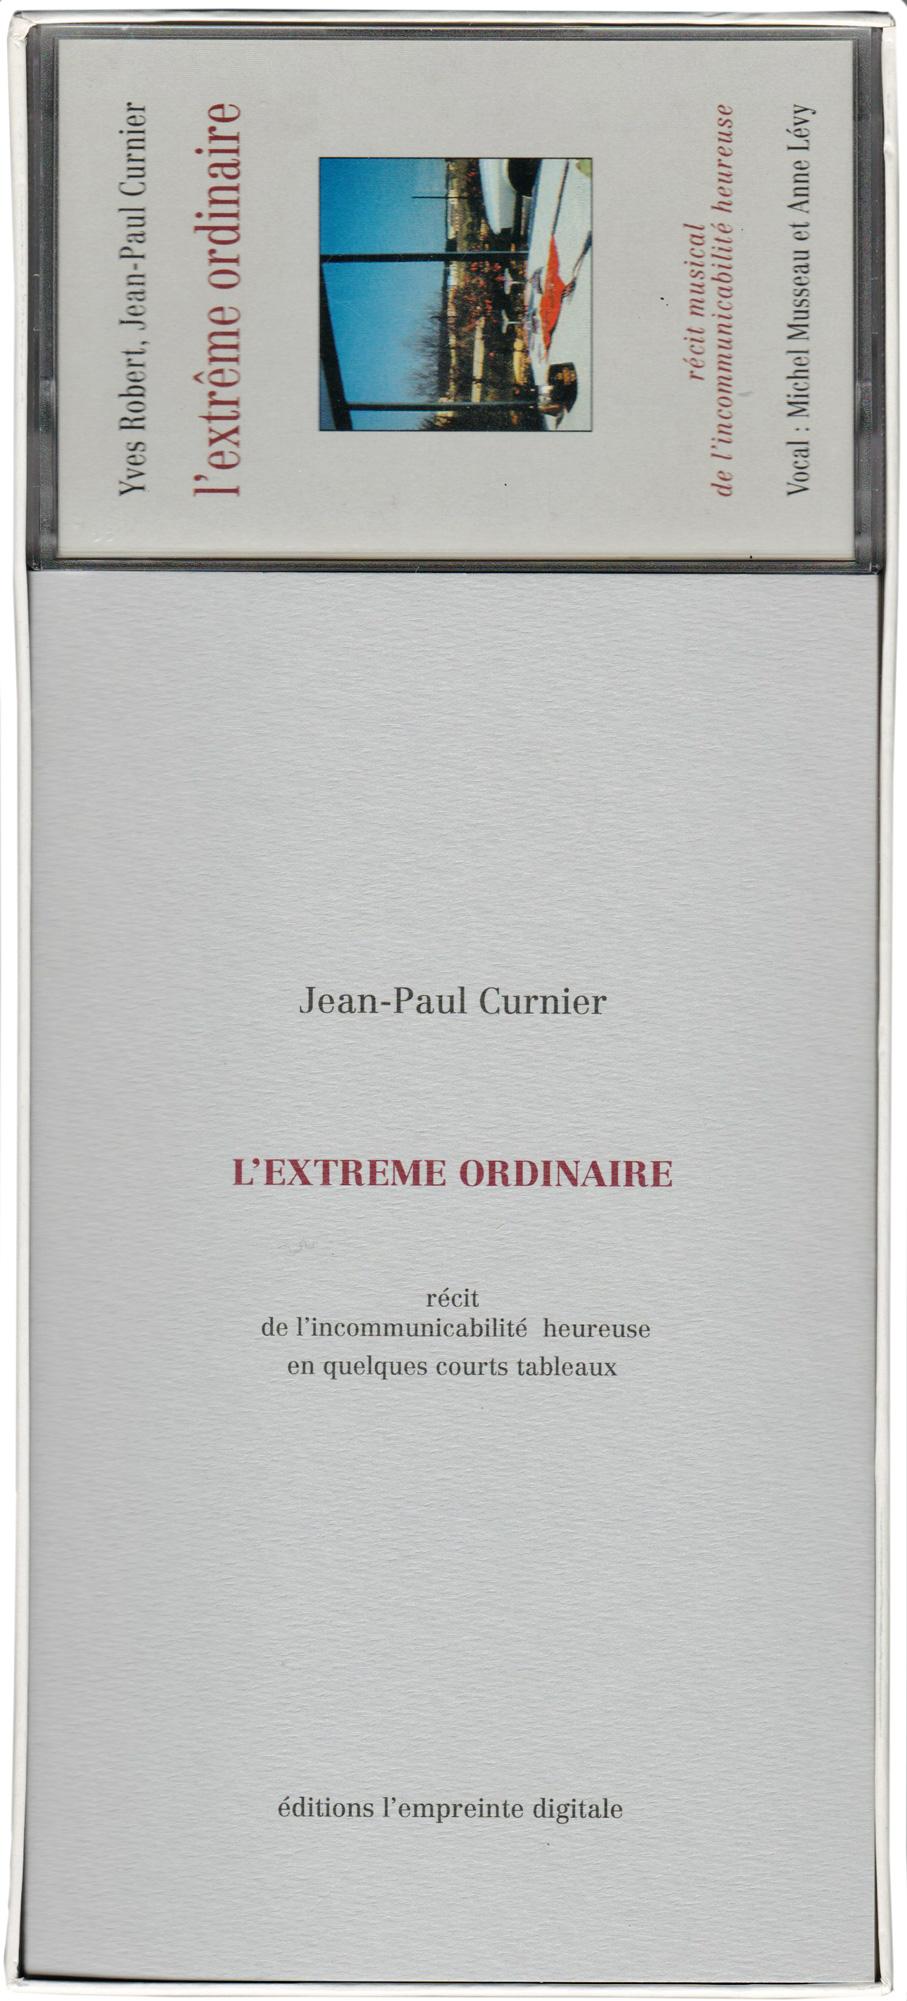 L'extrême ordinaire | Jean-Paul Curnier